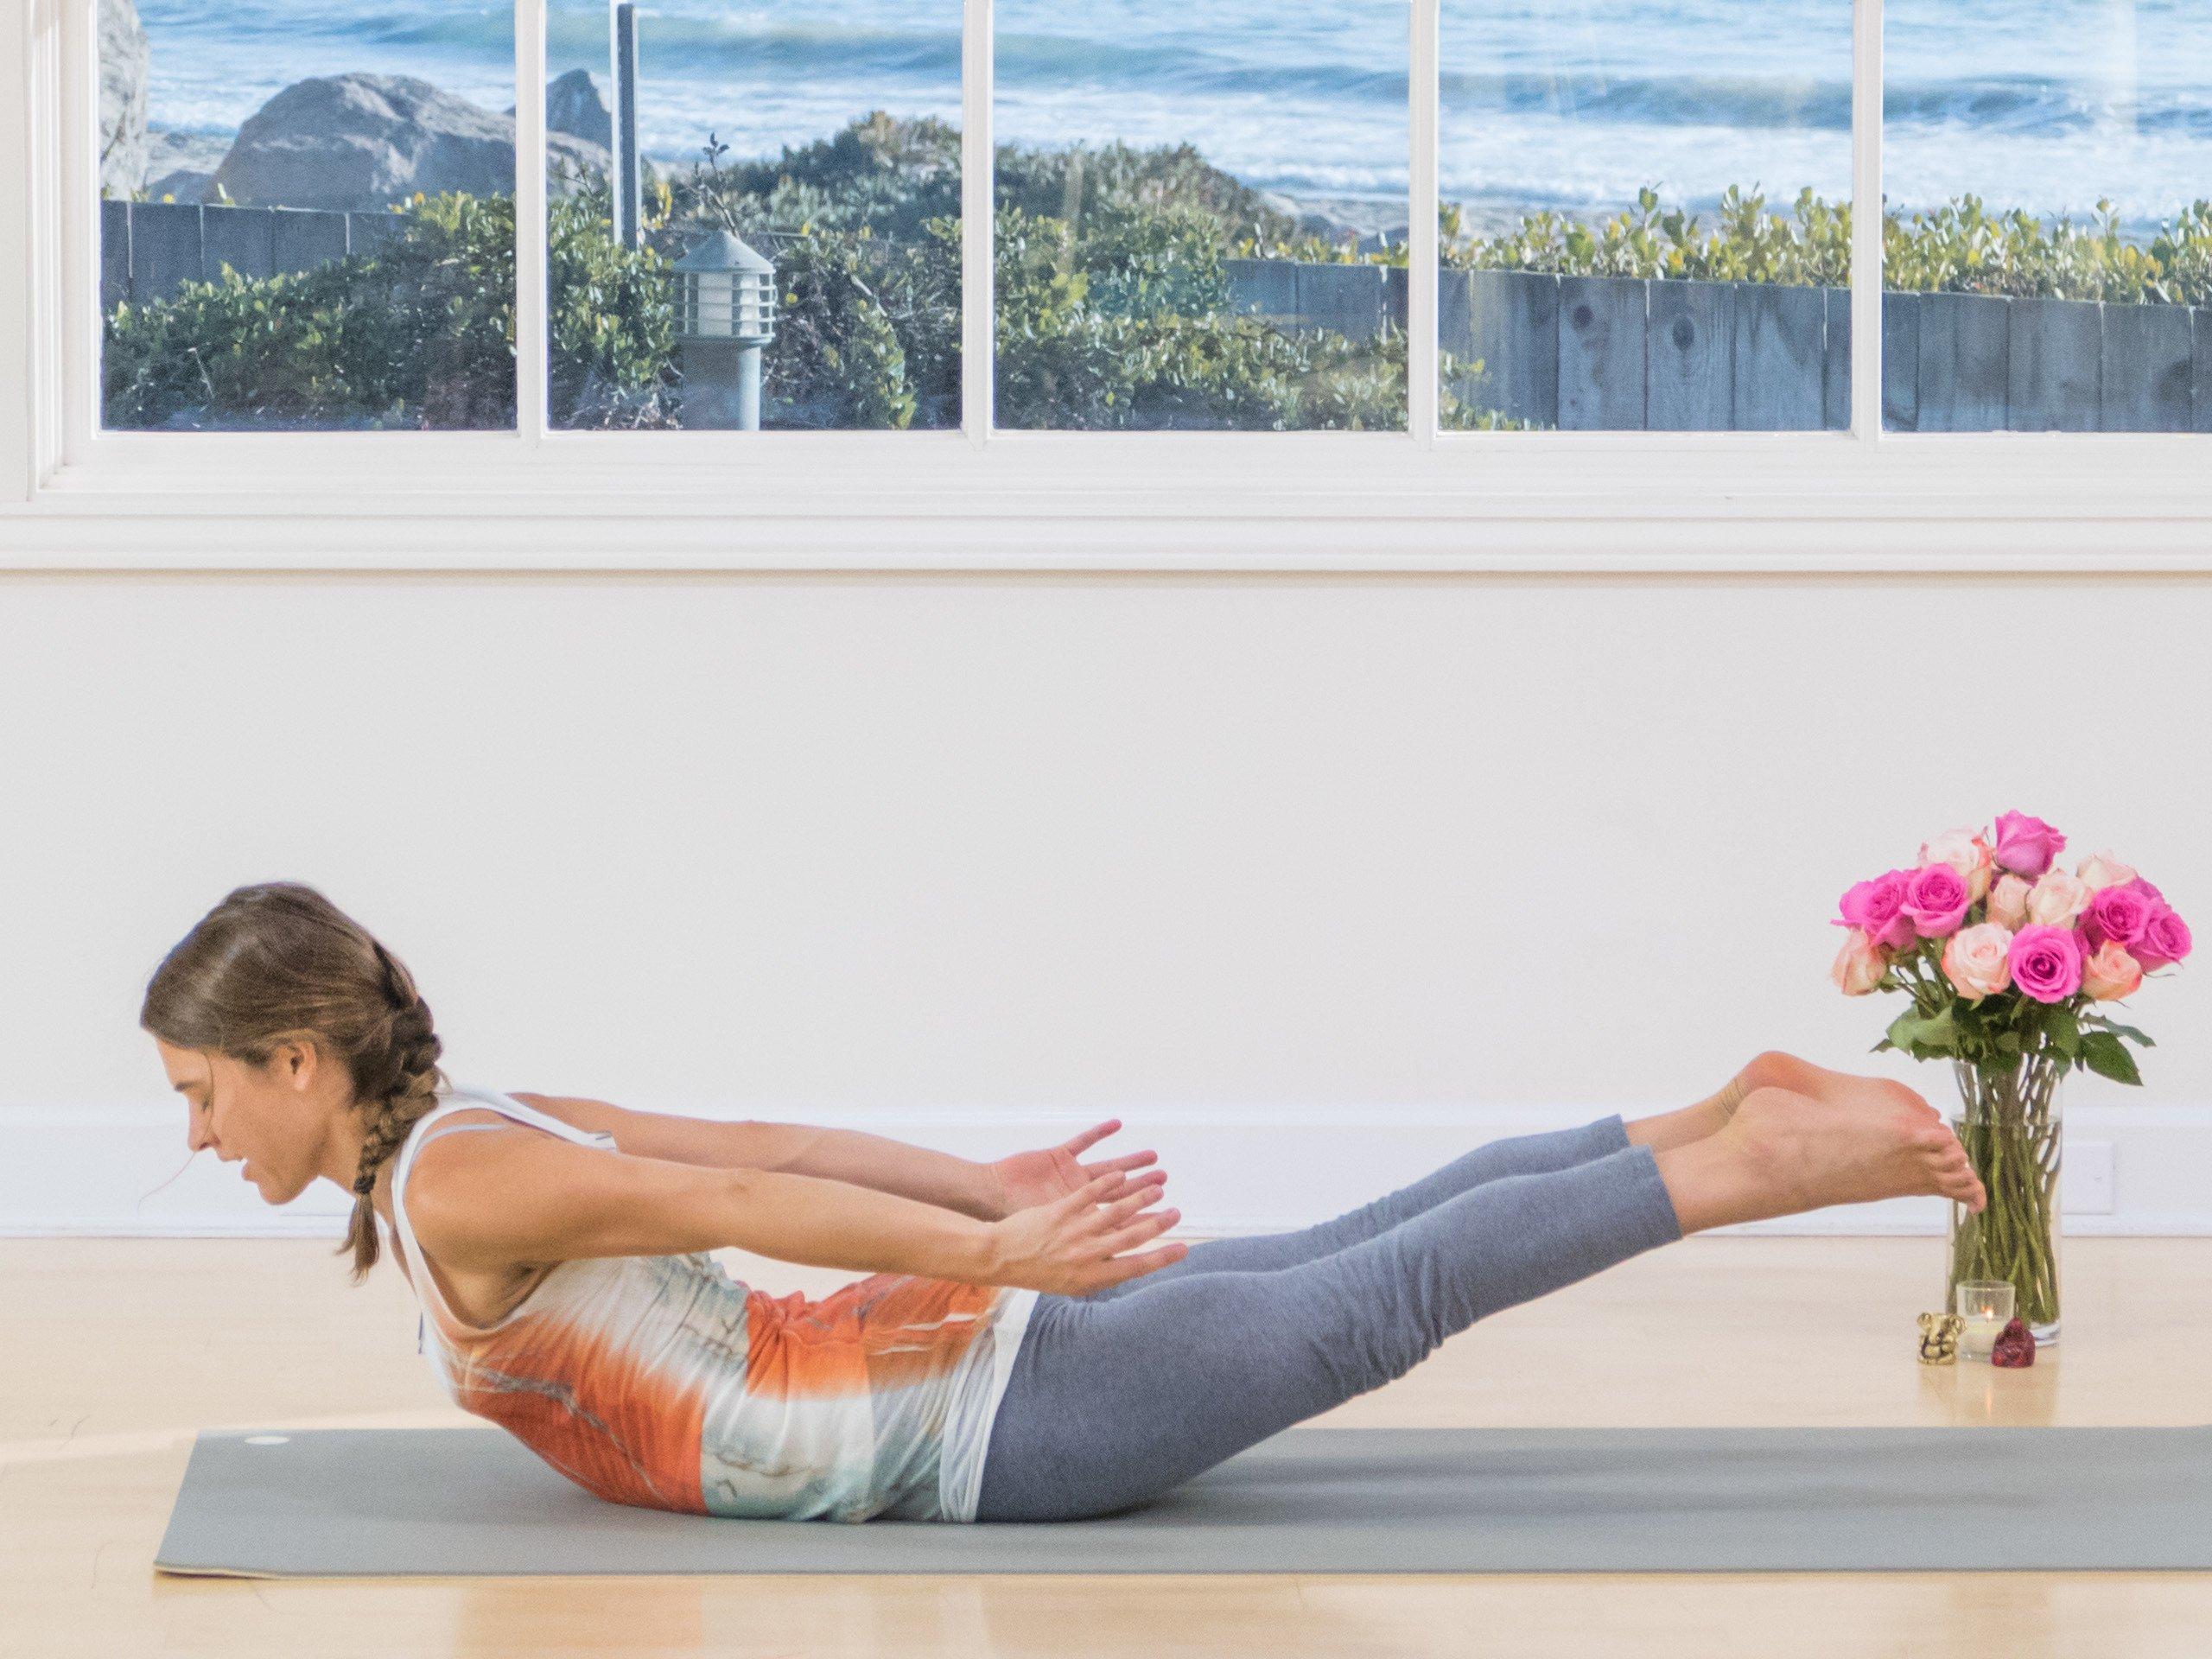 Amazon.com: Watch Good Morning Yoga - Season 1 | Prime Video